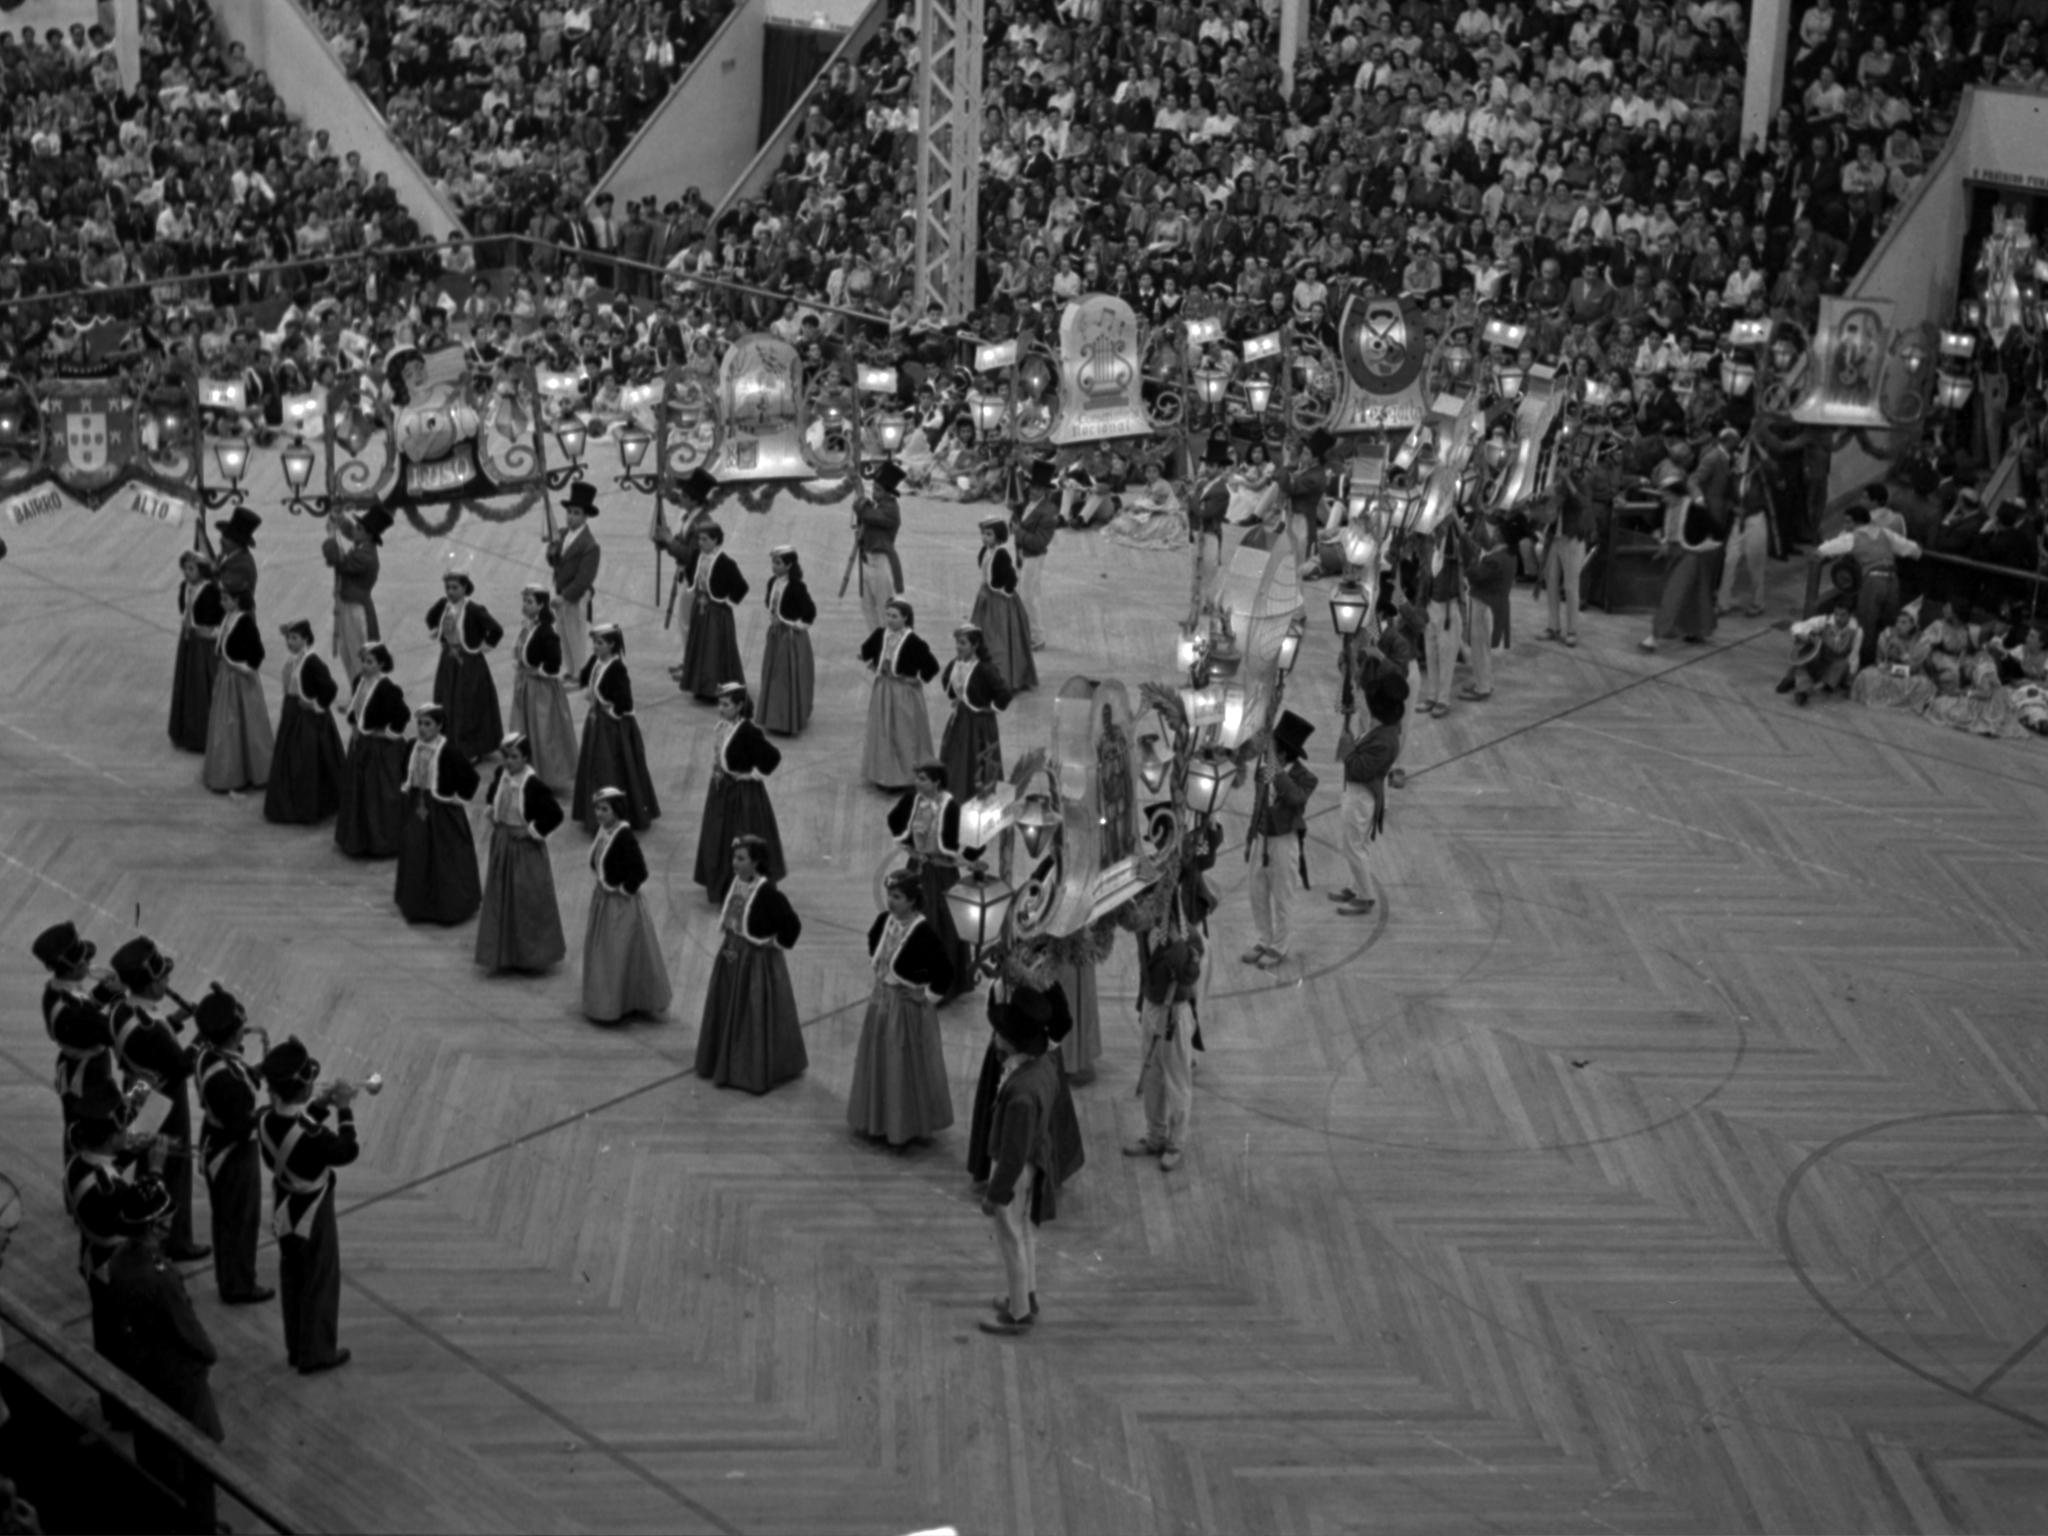 Desfile das marchas populares, marcha do Bairro Alto, no Pavilhão dos Desportos, 1955-06